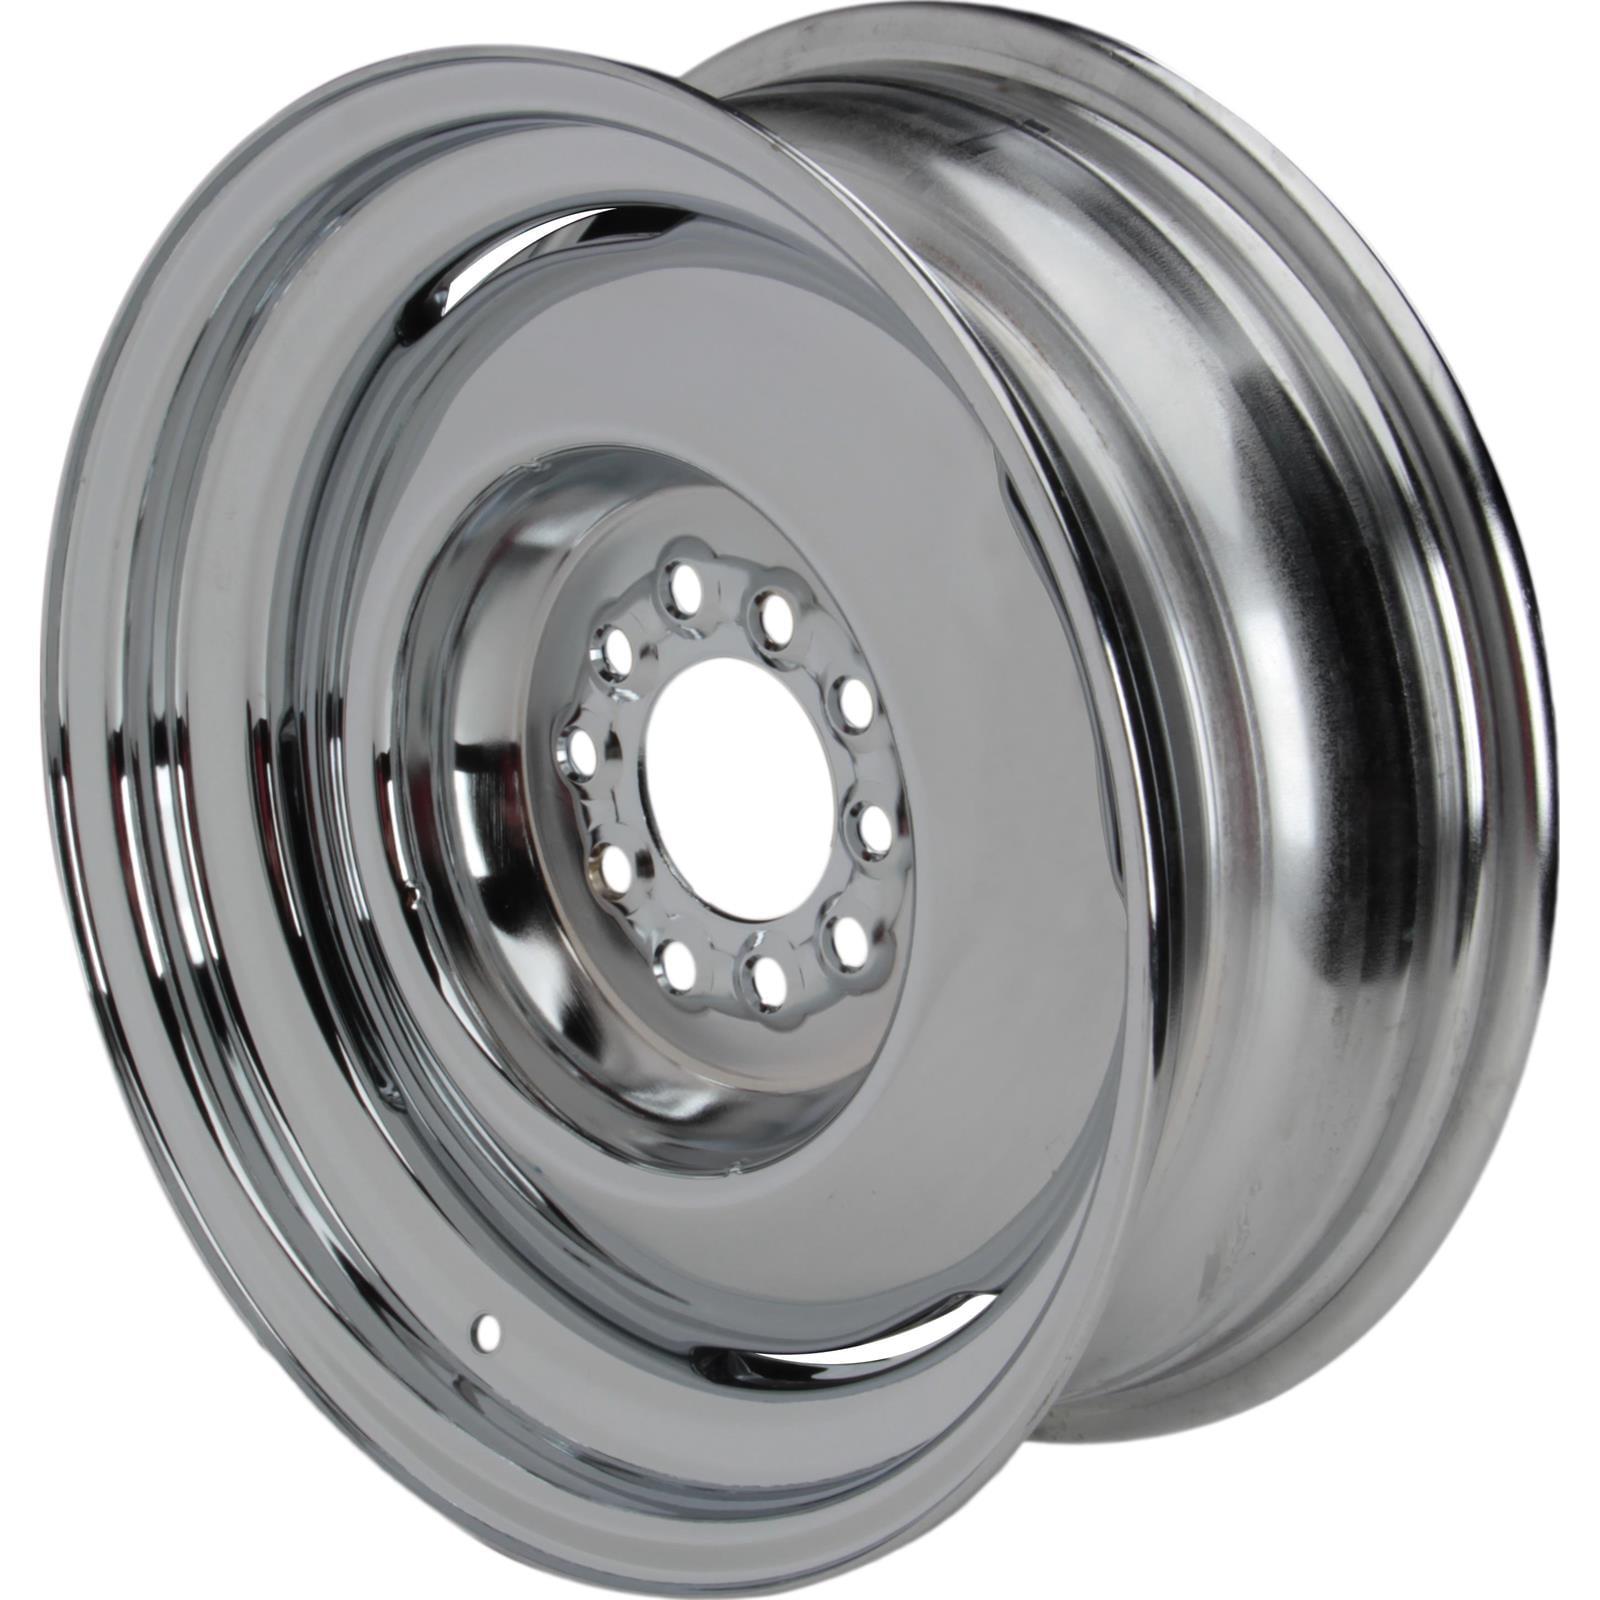 Speedway Vintage 15x6  Steel Wheel, 5 on 4.5/4.75, 3.5 Inch BS